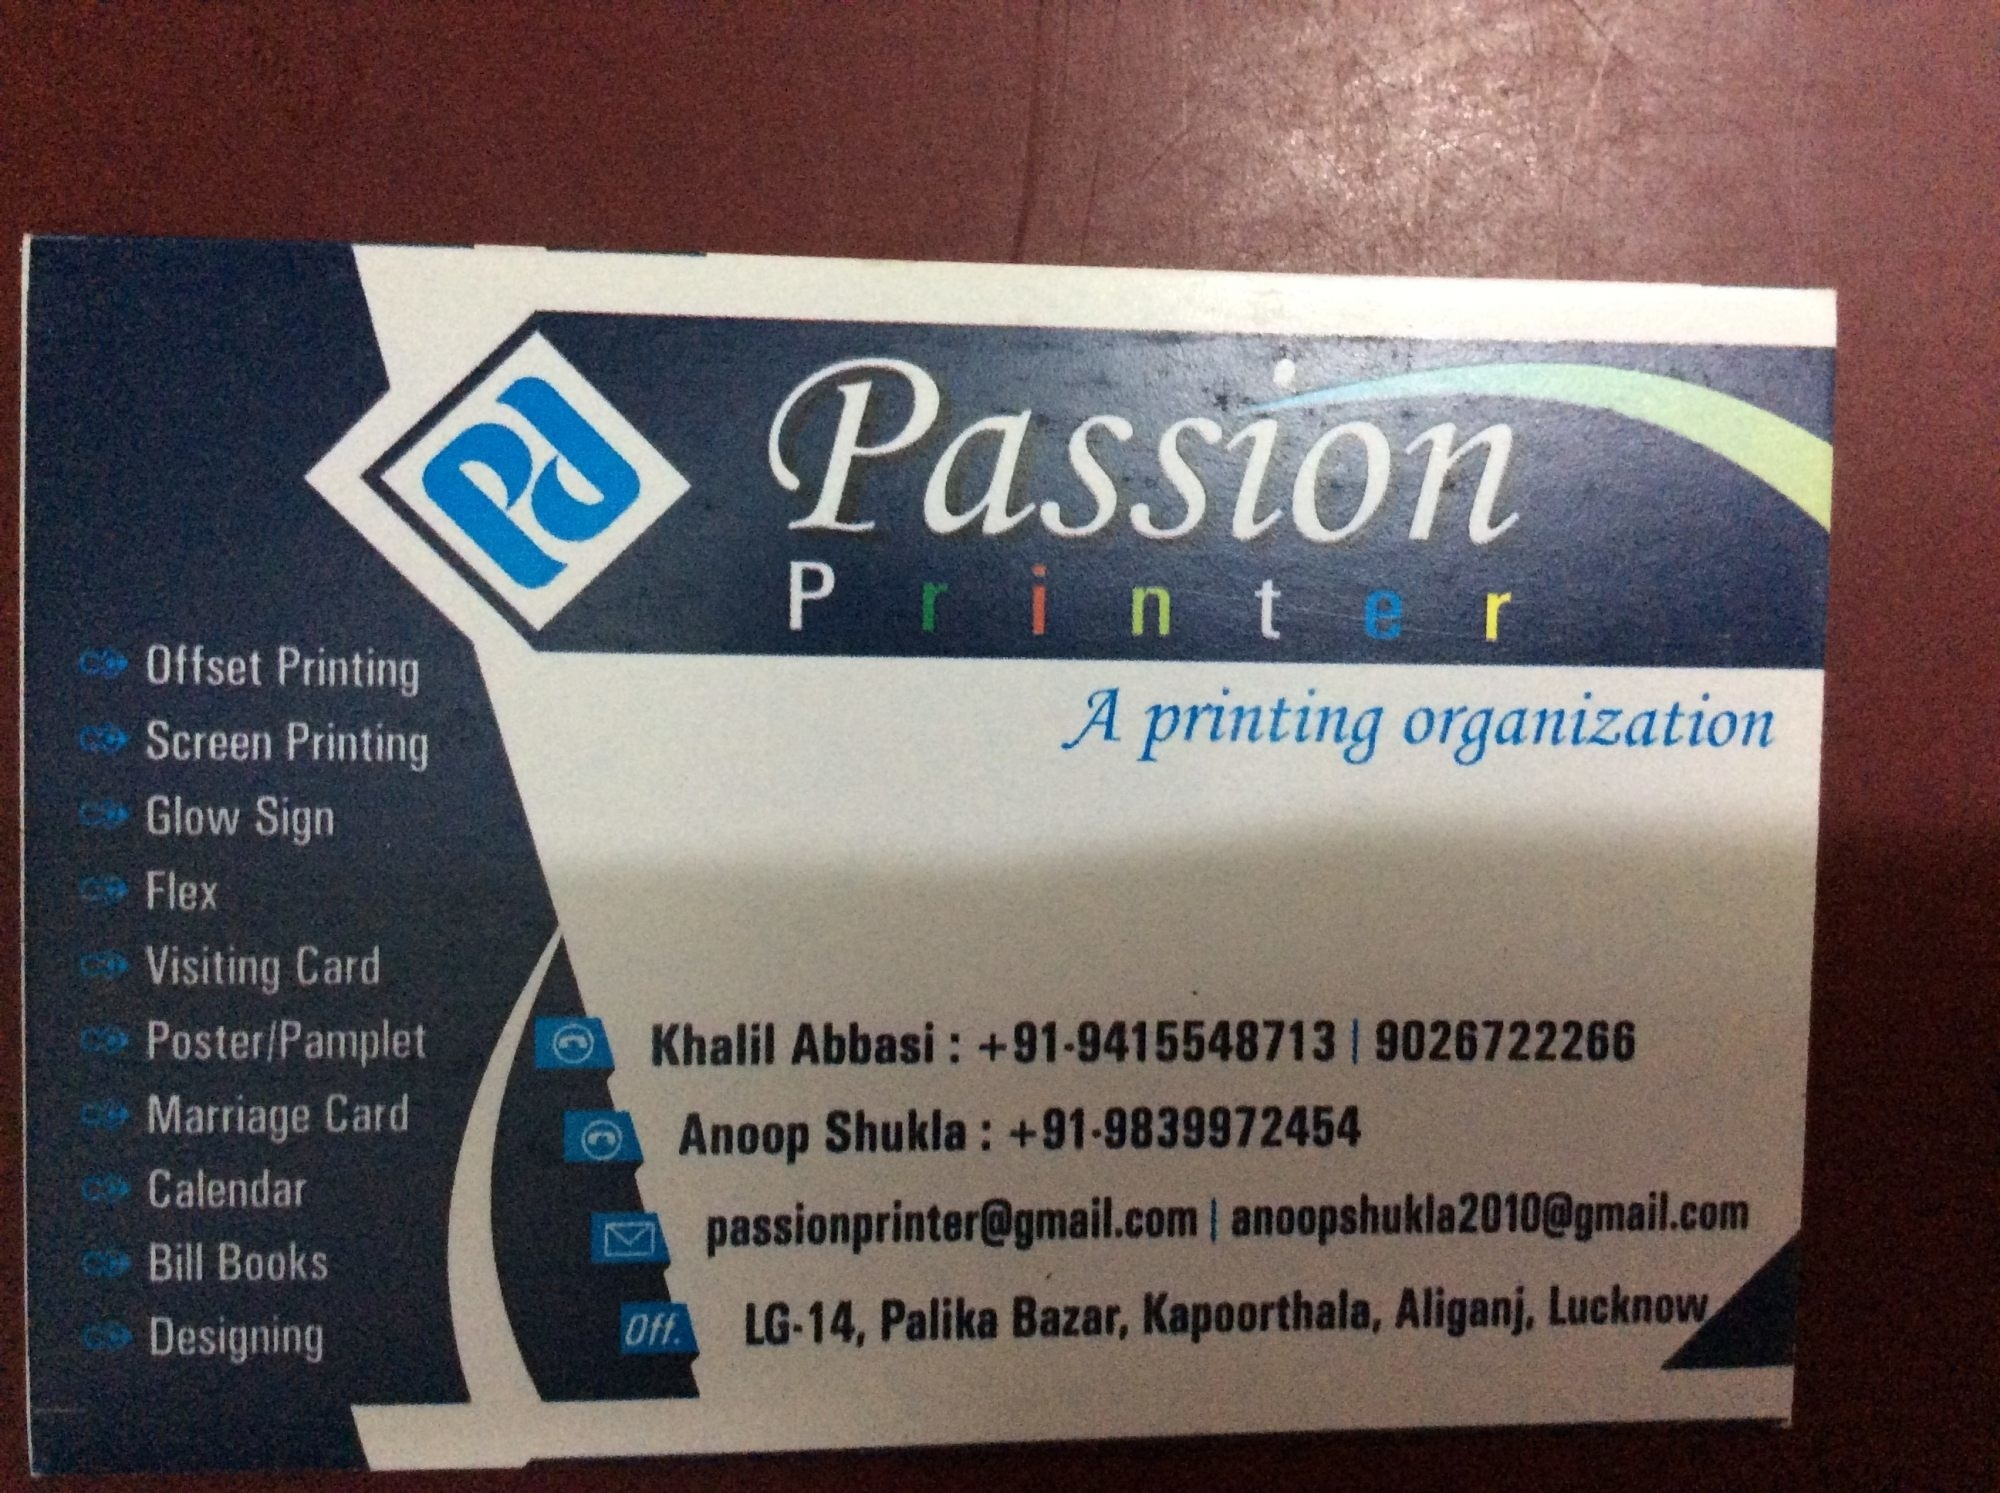 Mahi Printers, Aliganj - Printing Press In Lucknow - Justdial_Calendar Printing In Lucknow